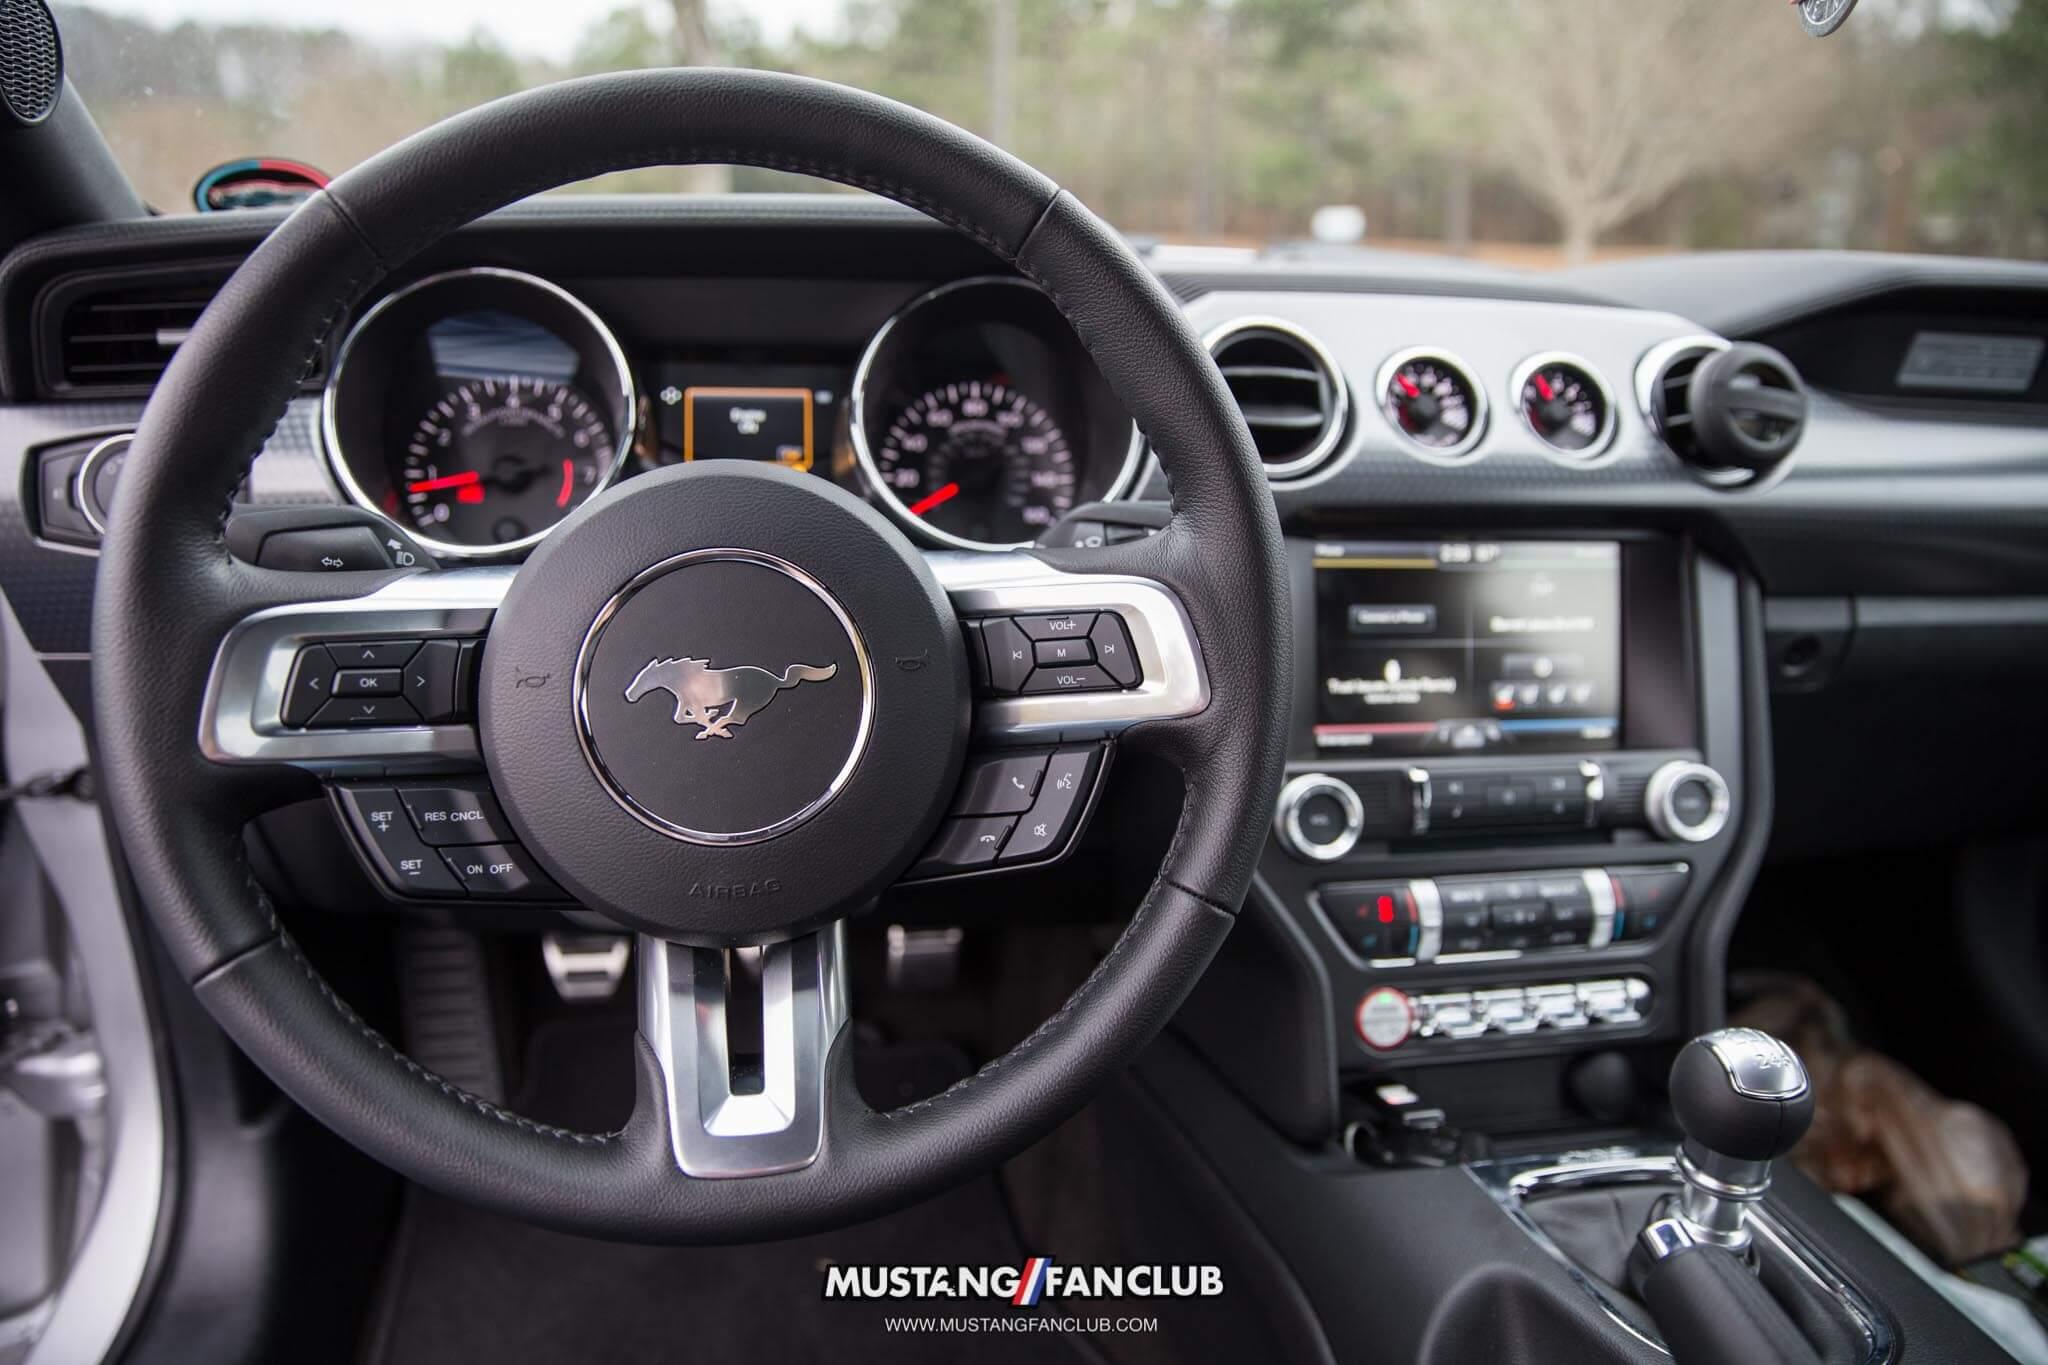 Stock S550 Mustang Steering Wheel Mustang Fan Club